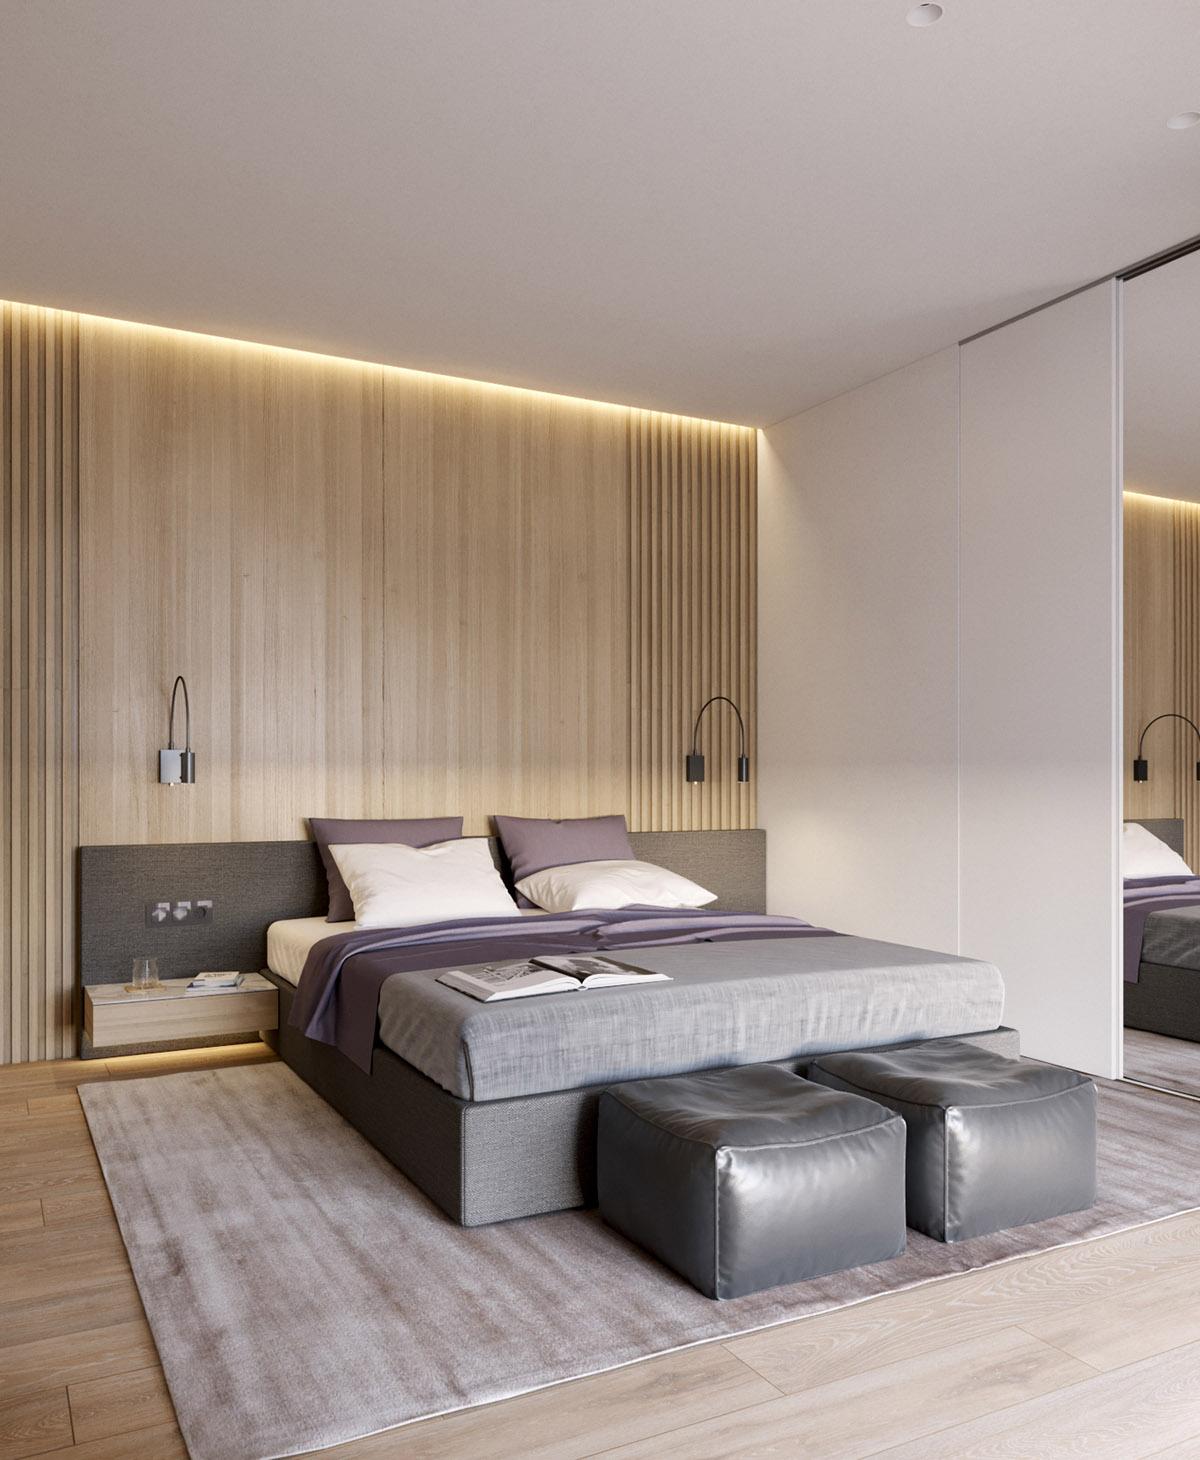 grey-and-purple-bedroom-design-inspiration